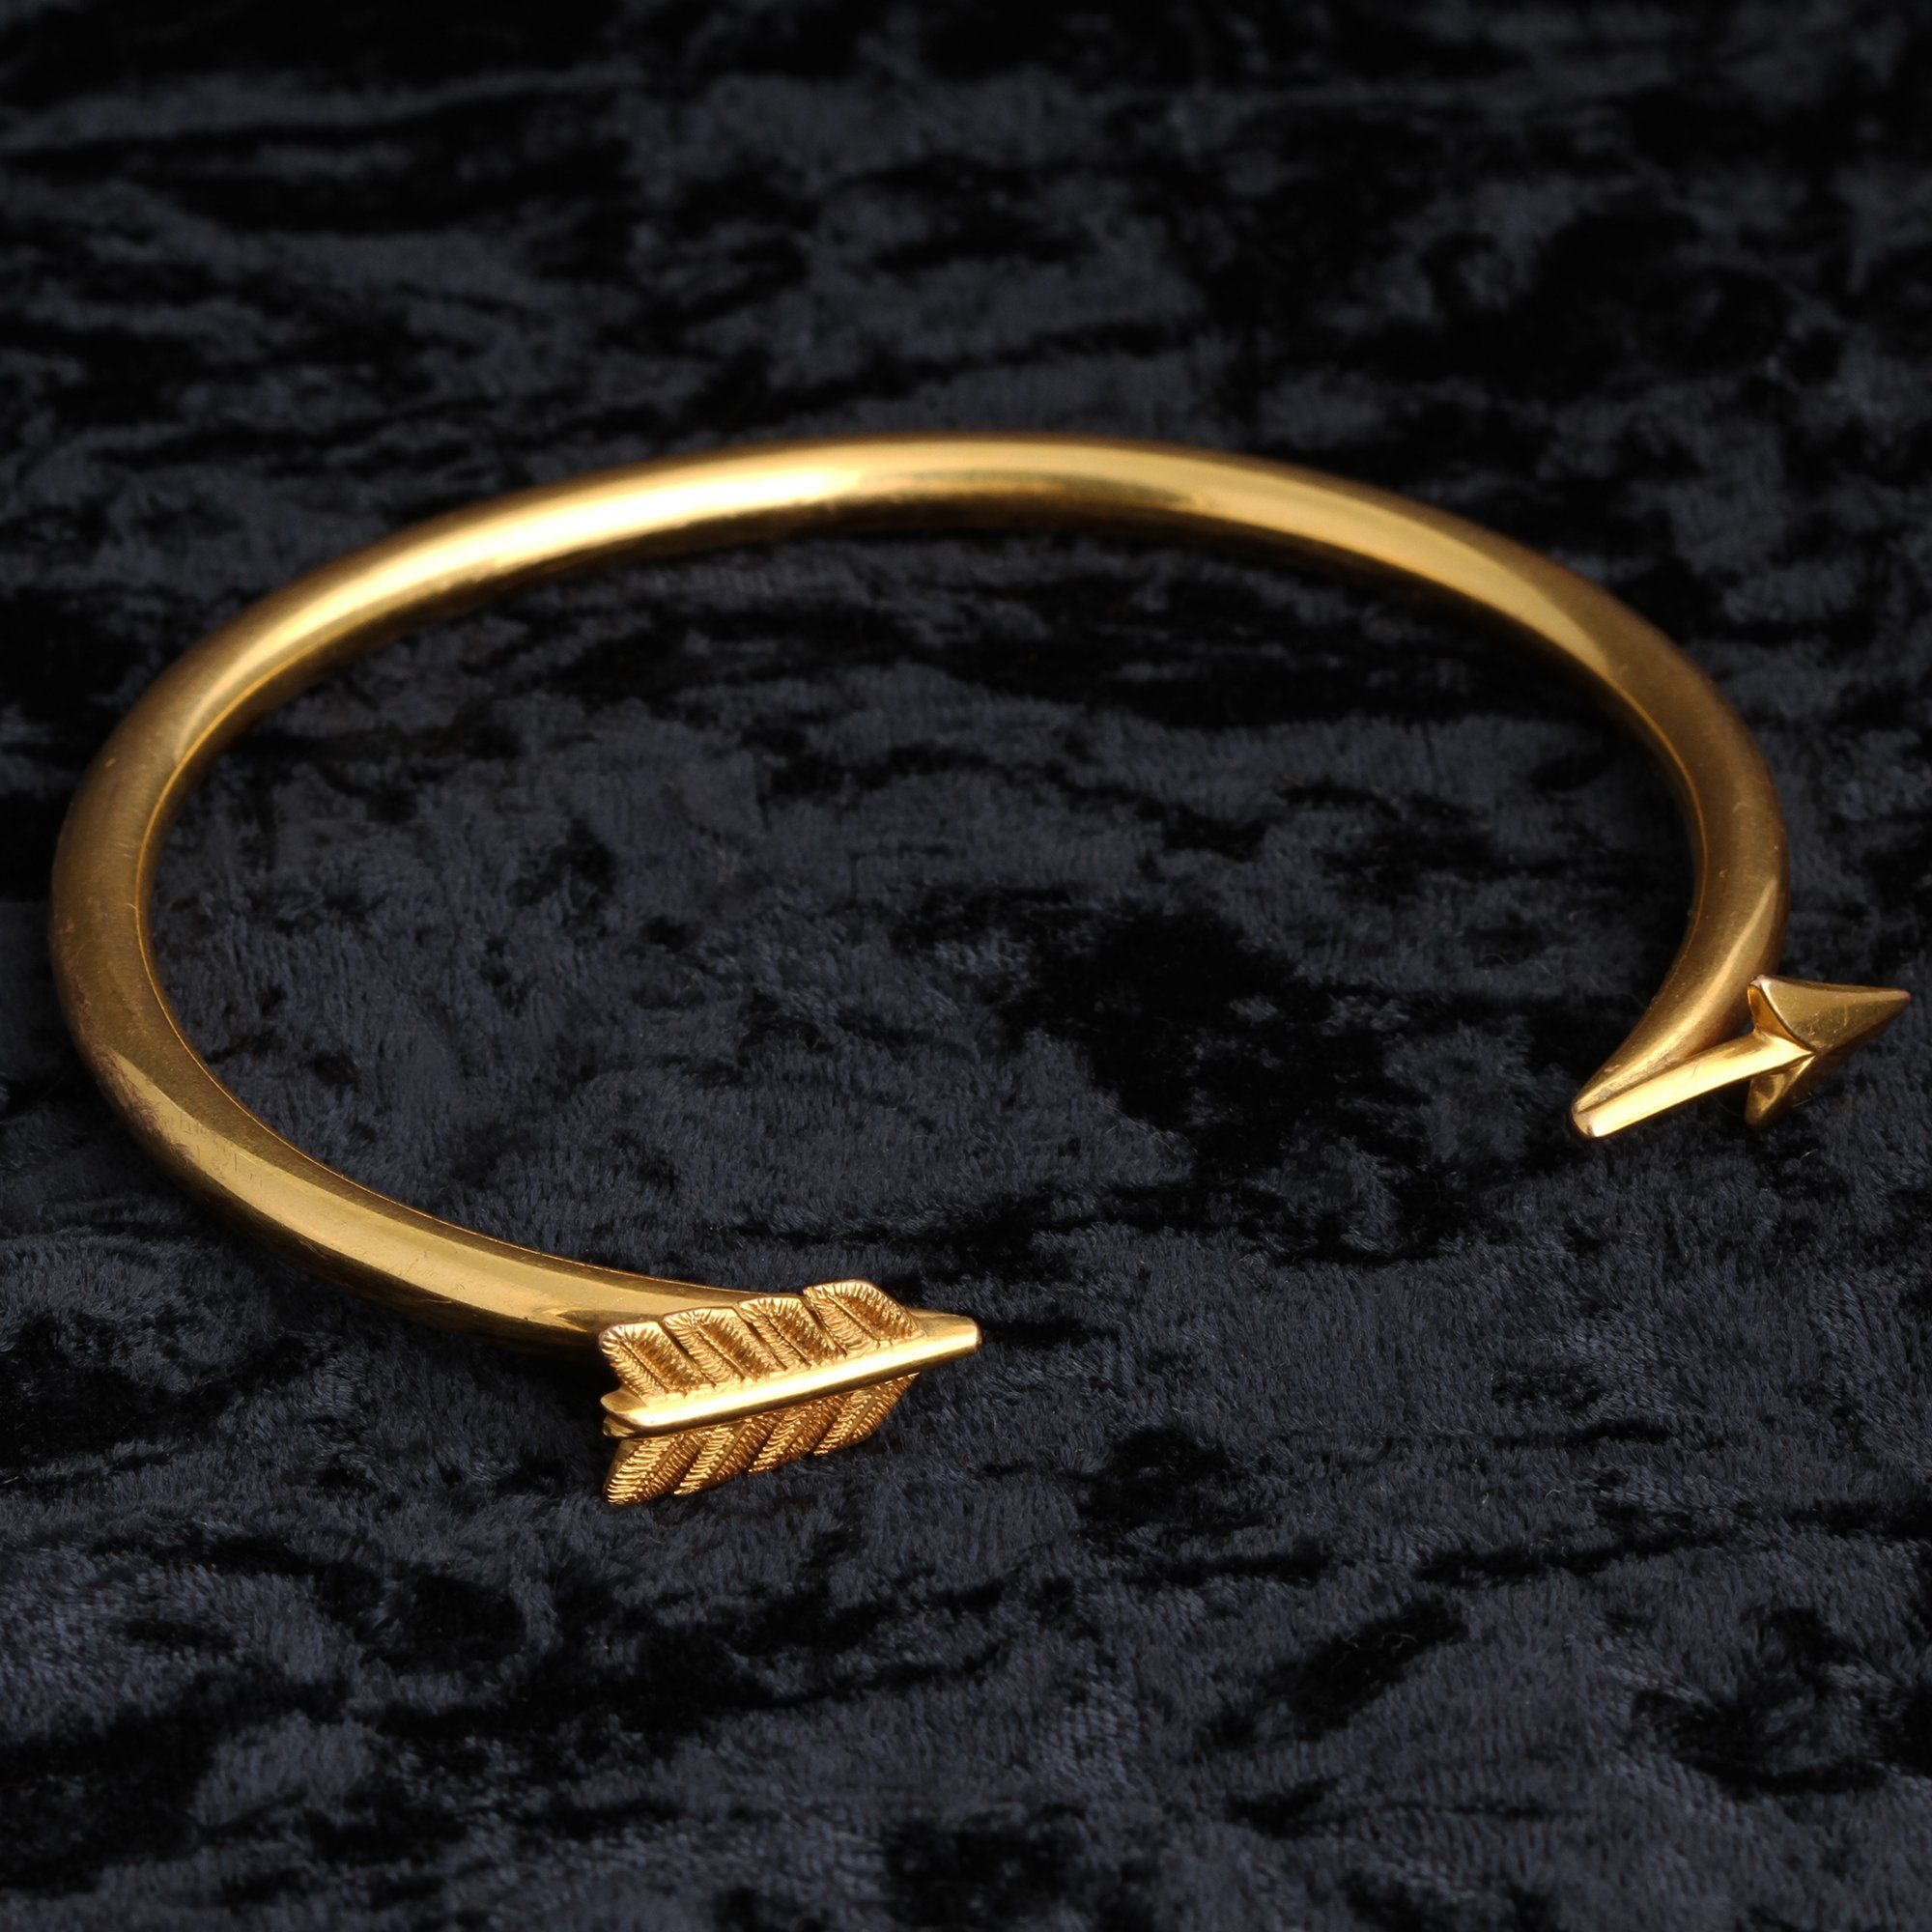 Detail of 1920s Golden Arrow Upper Arm Bracelet